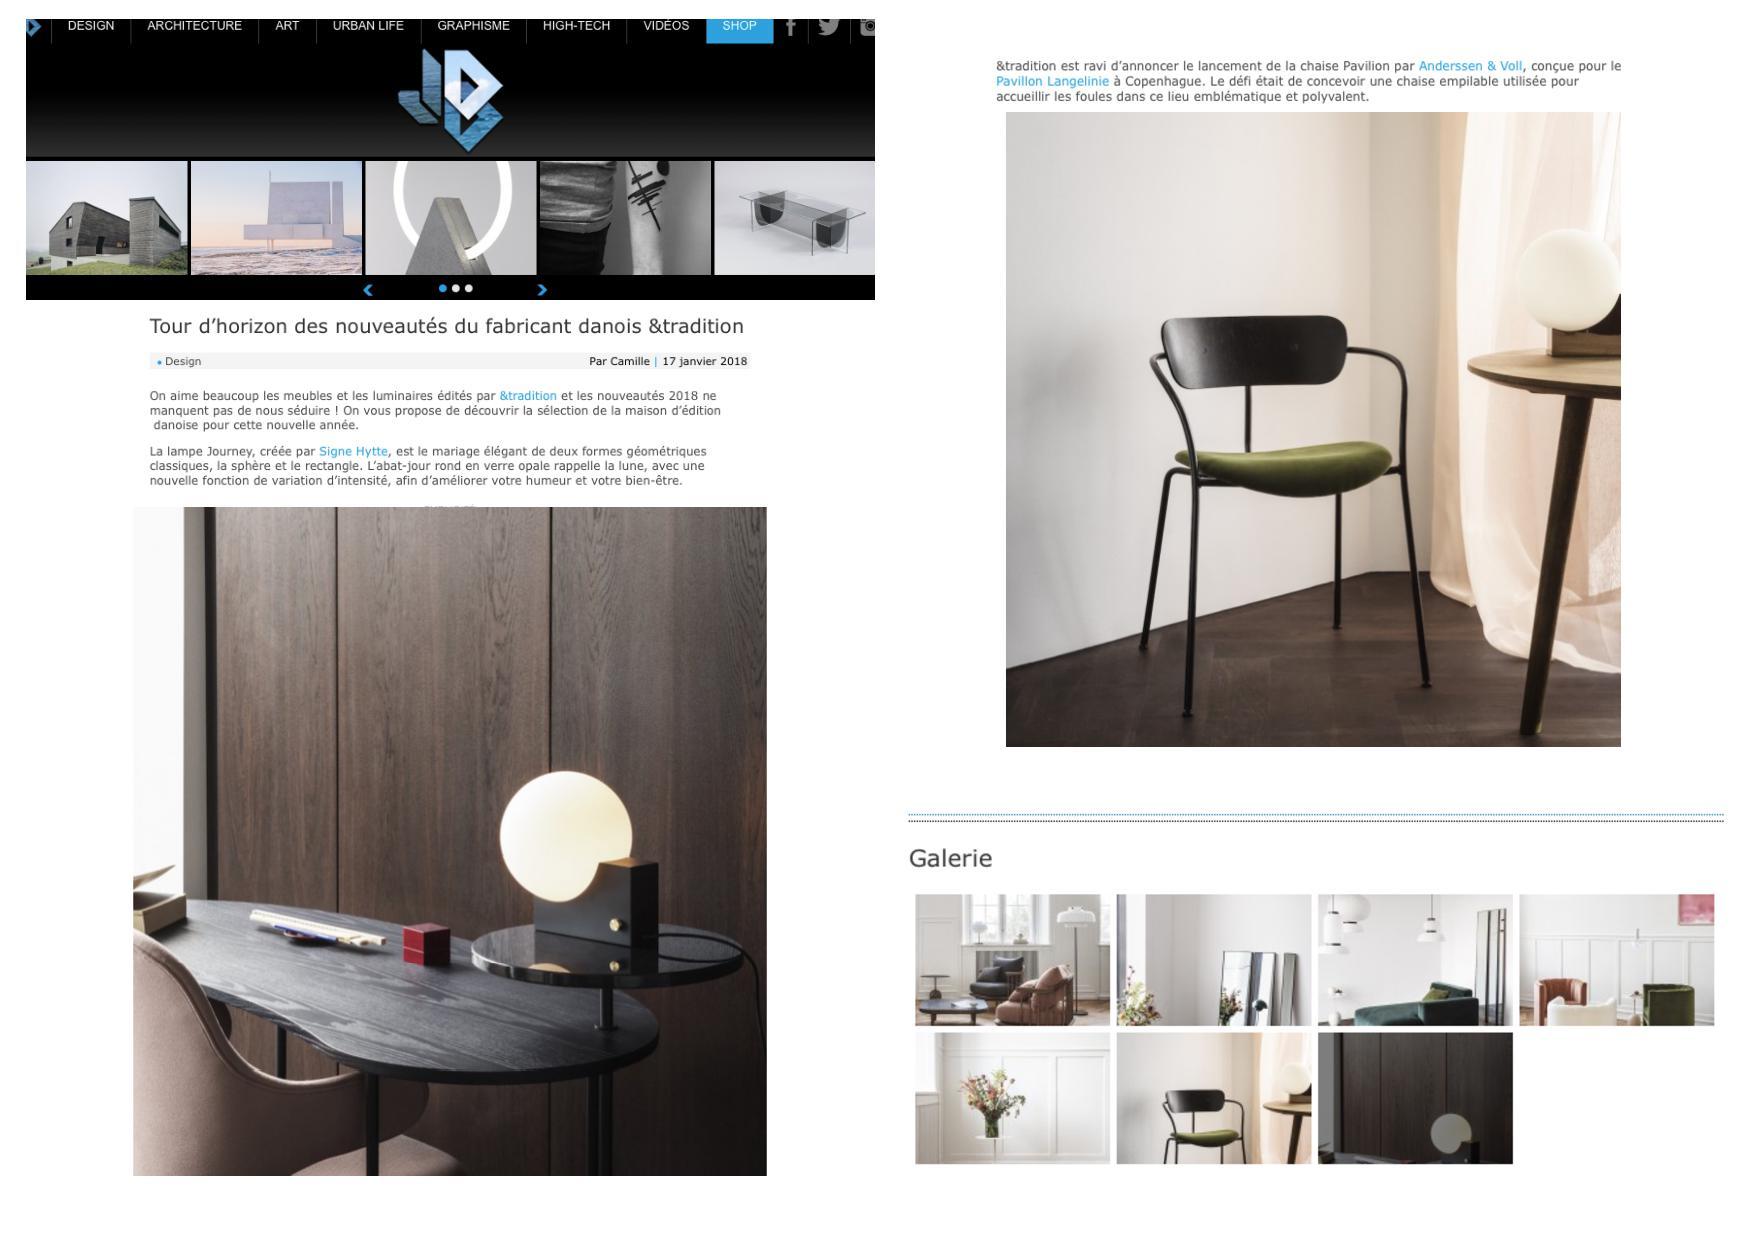 Le journal du design janvier 2018.jpg